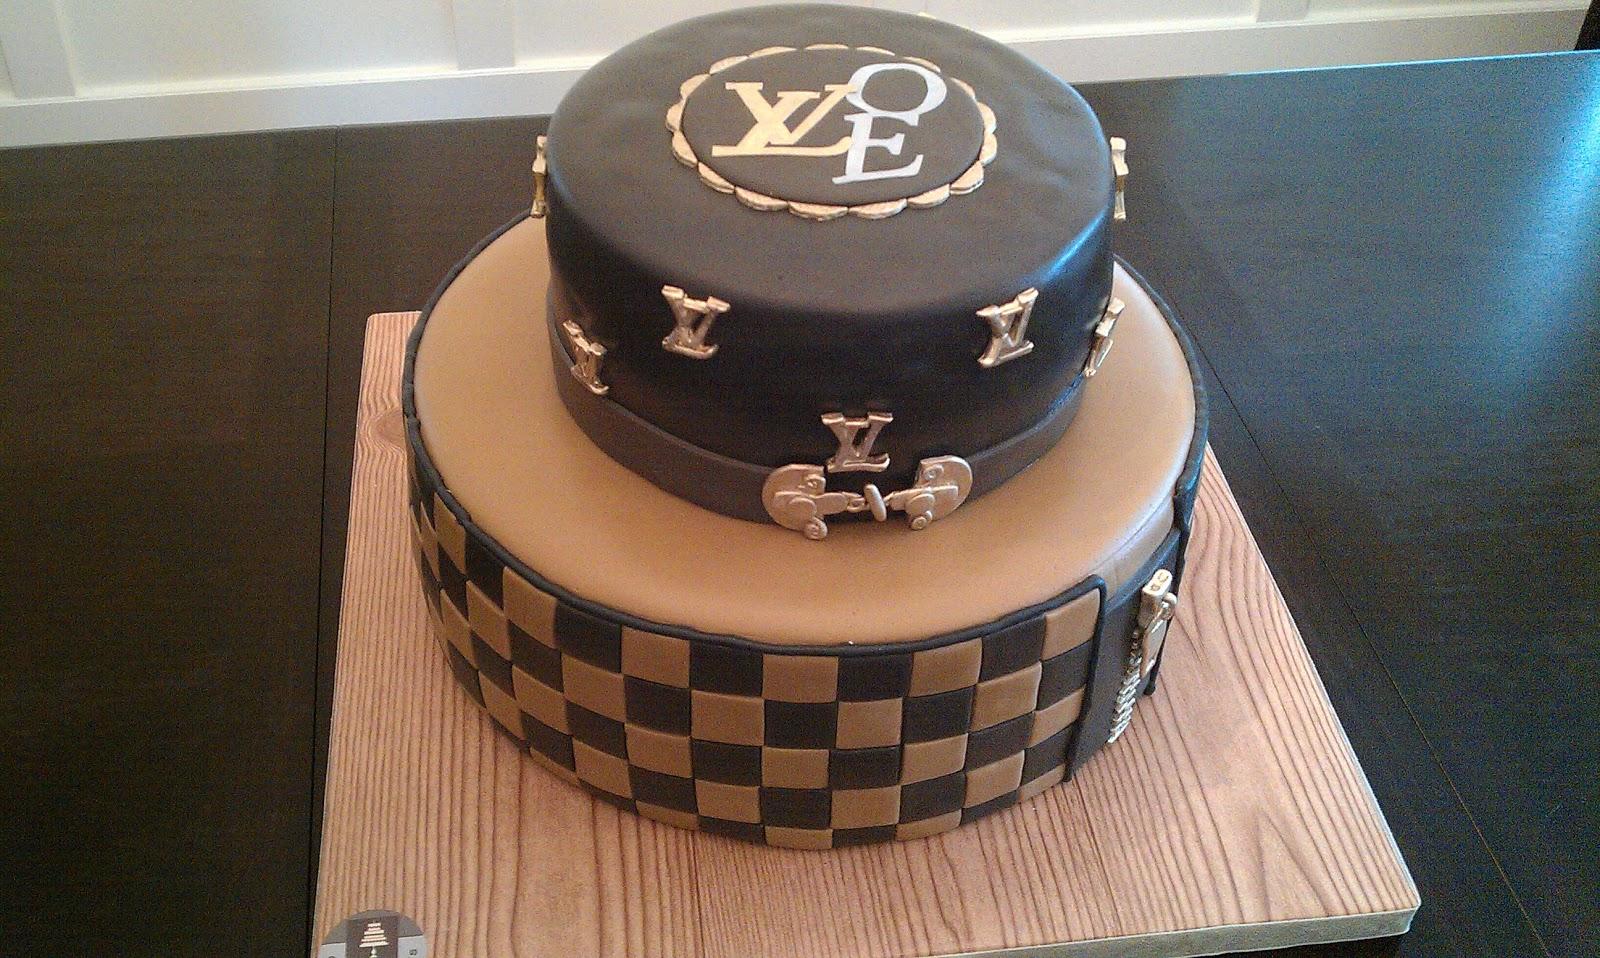 Edible Cake Images Louis Vuitton : Cake Geniuses: Louis Vuitton Cake